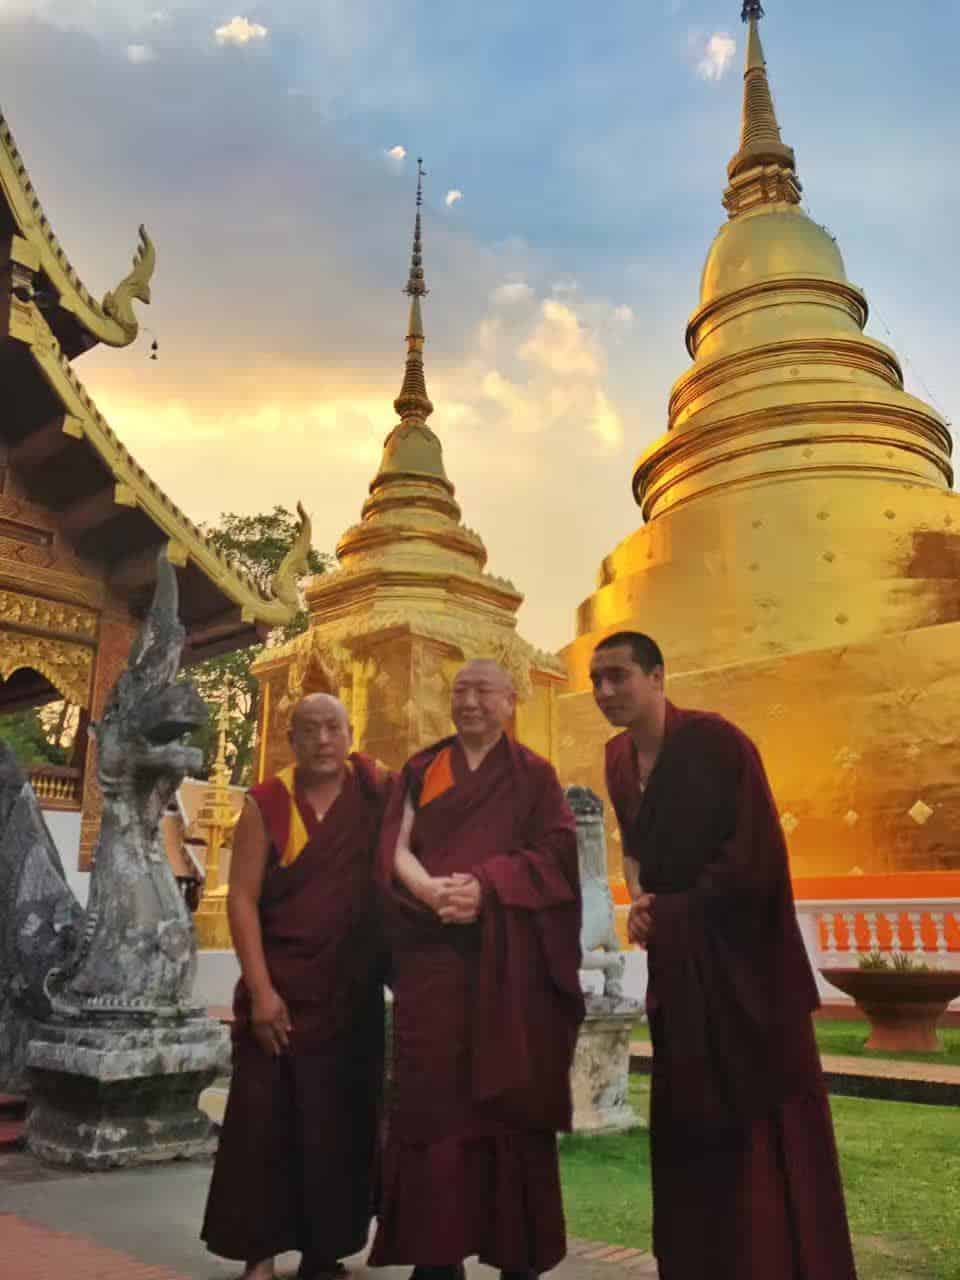 Gosok Rinpoche Thailand 2017 T006 cfac4cd5a207dfa9418aedac0c8f815